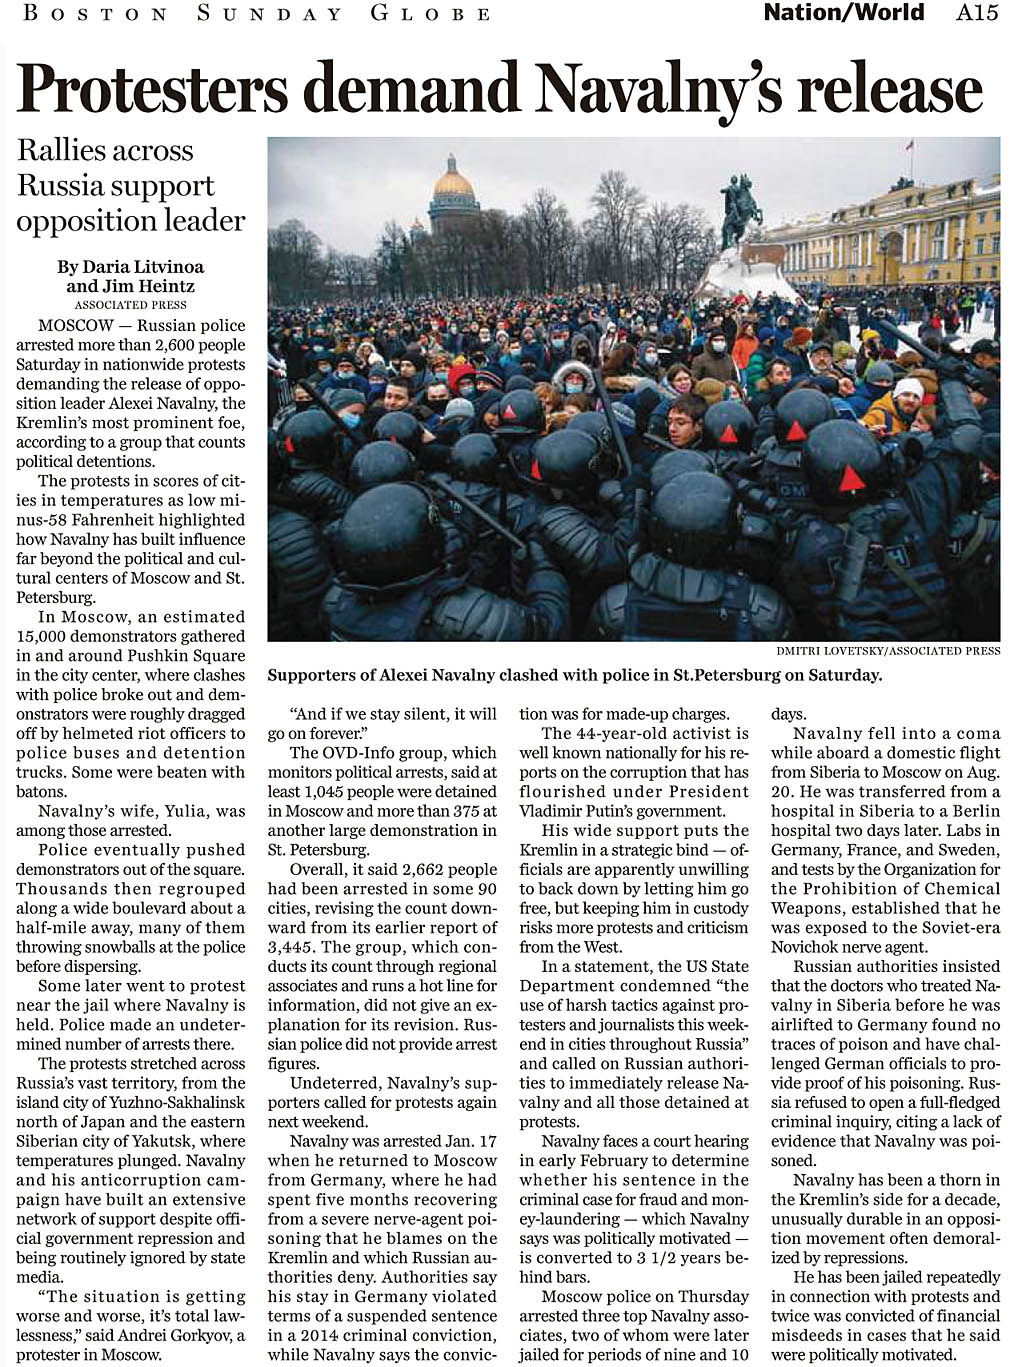 Boston Globe 210124 Russia.jpg